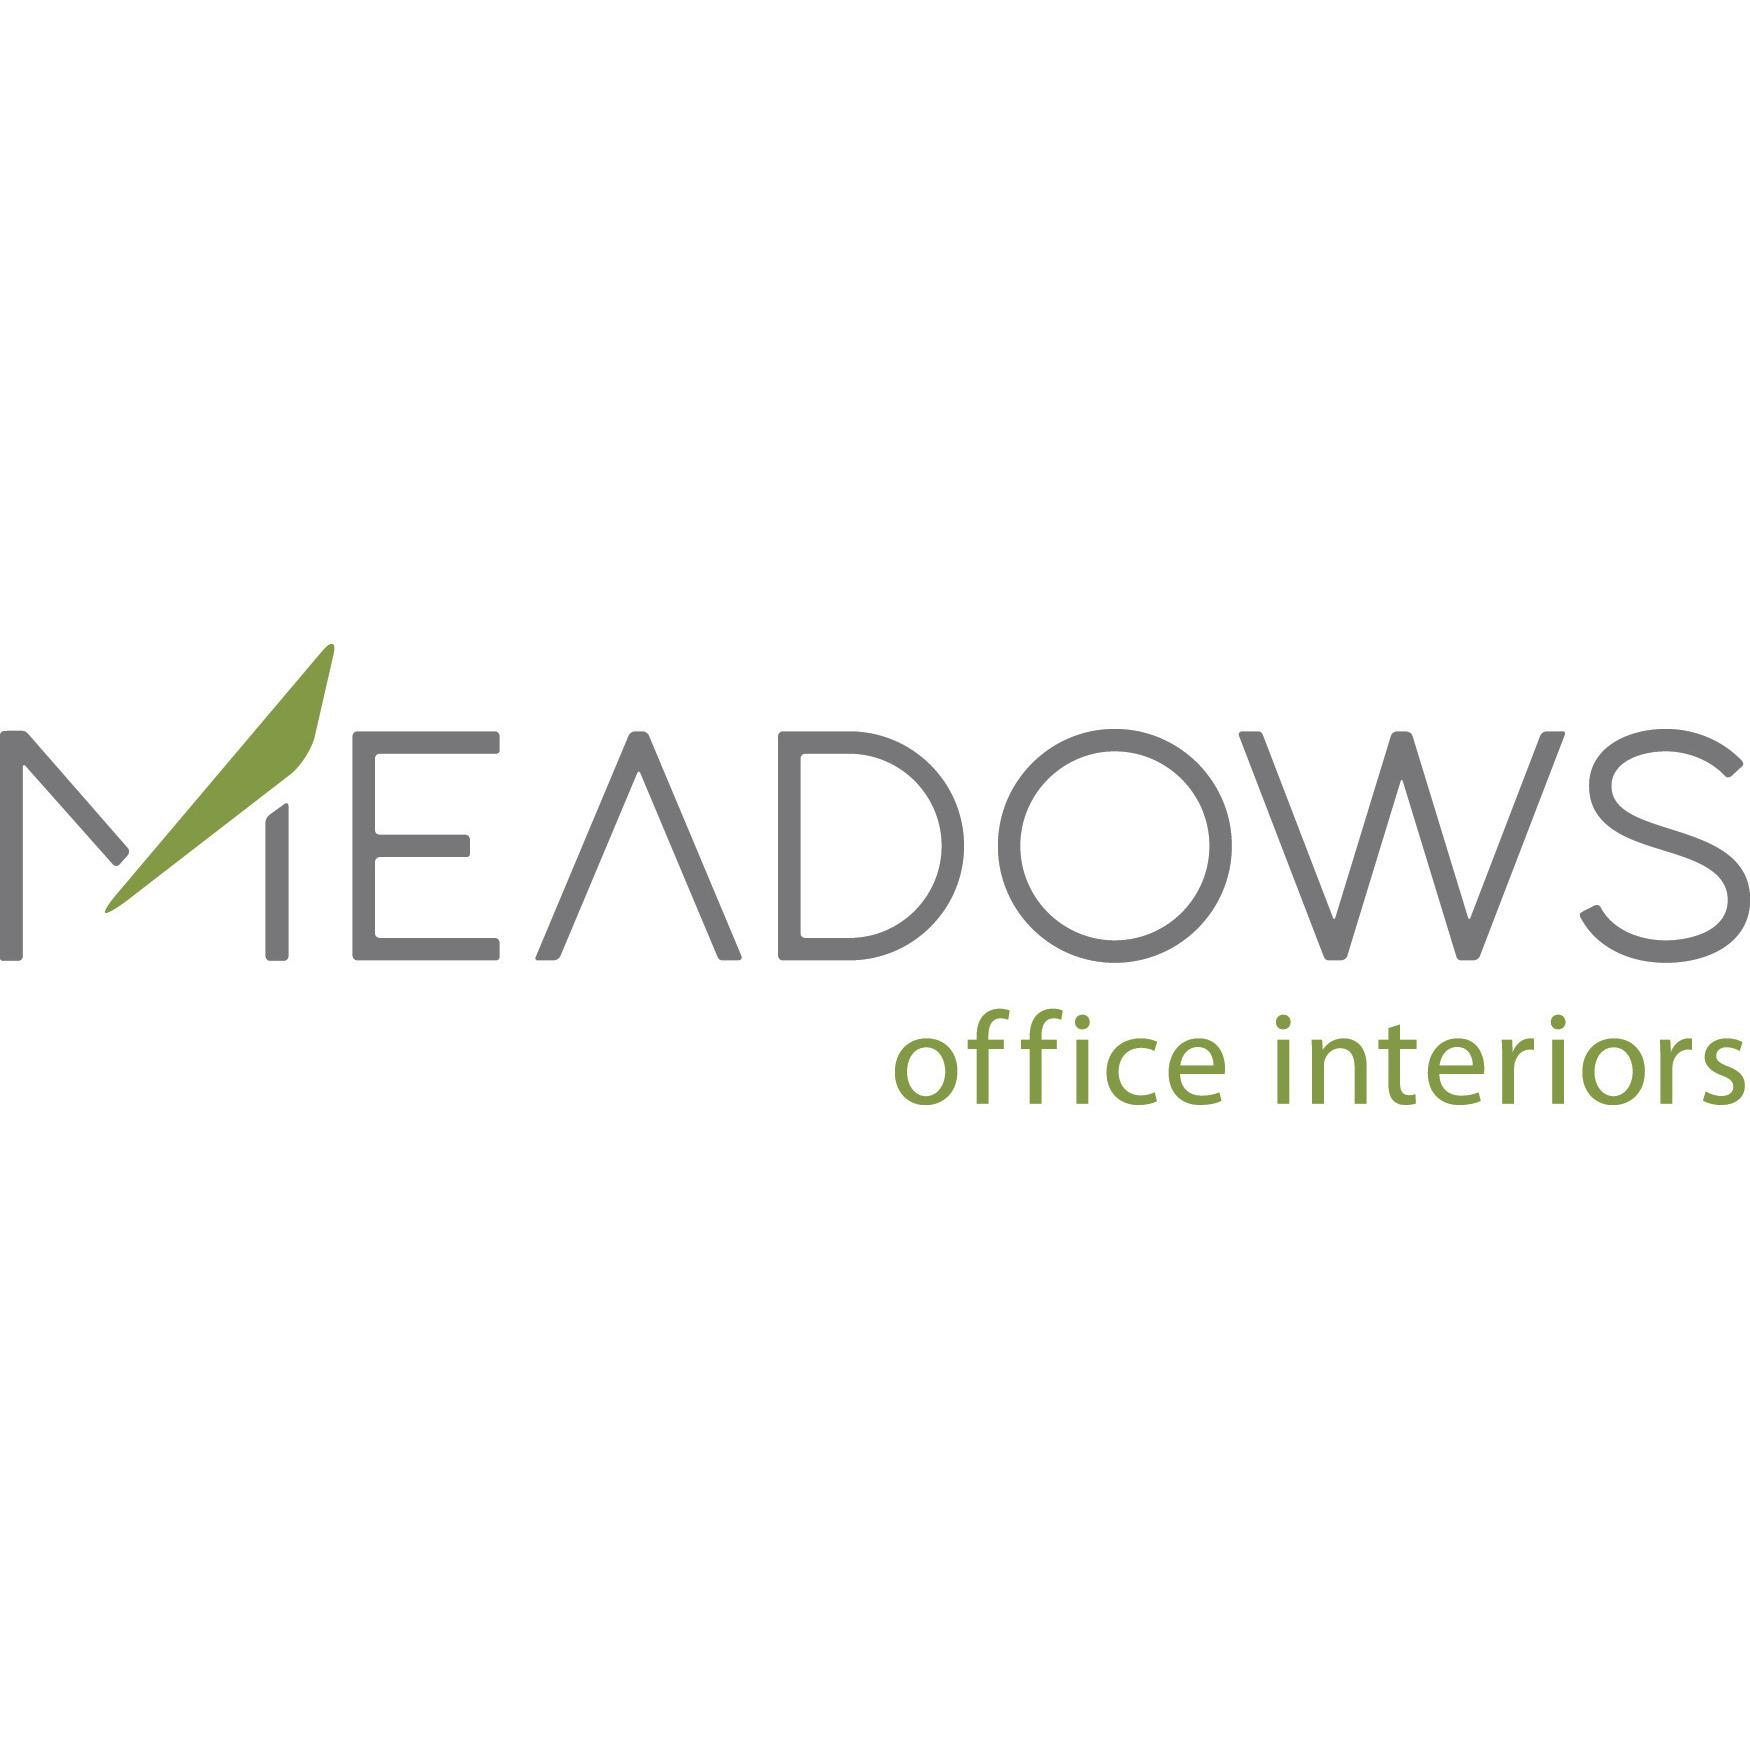 Meadows Office Interiors